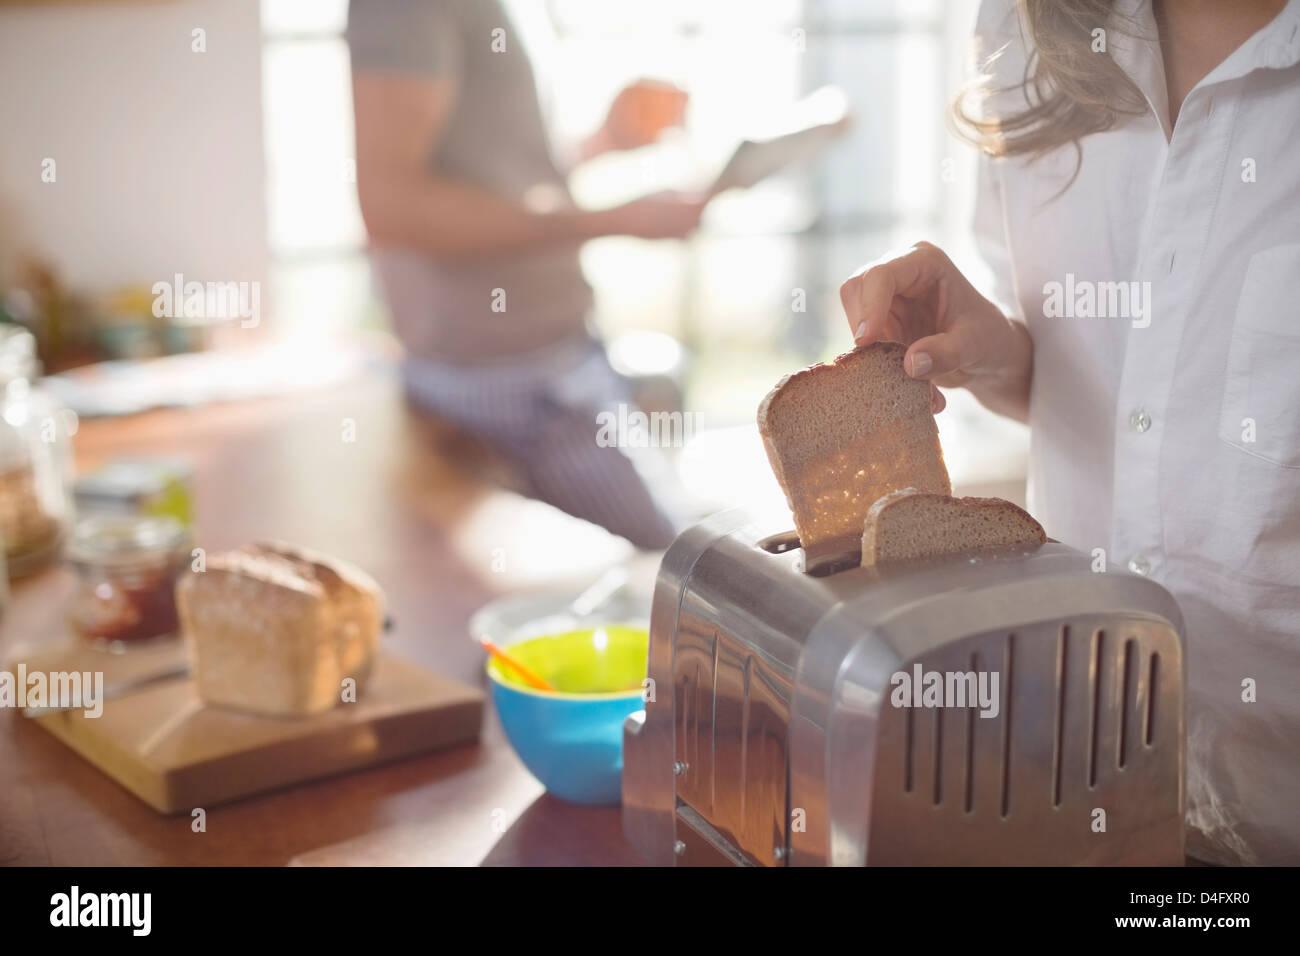 Mujer poner pan en la tostadora Imagen De Stock